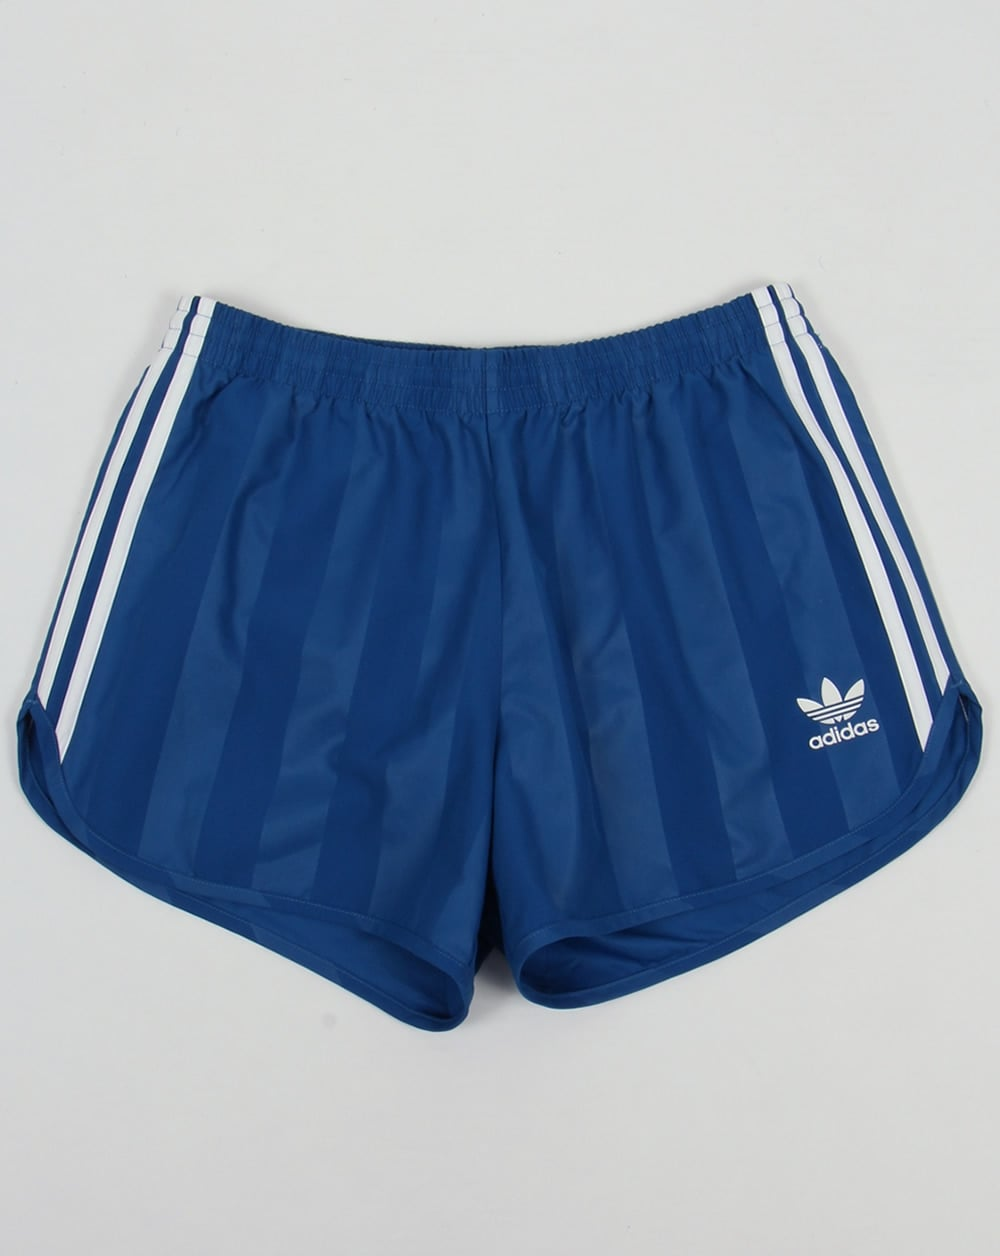 Adidas Originals Football Shorts Royal Blue - eqt - Adidas ...